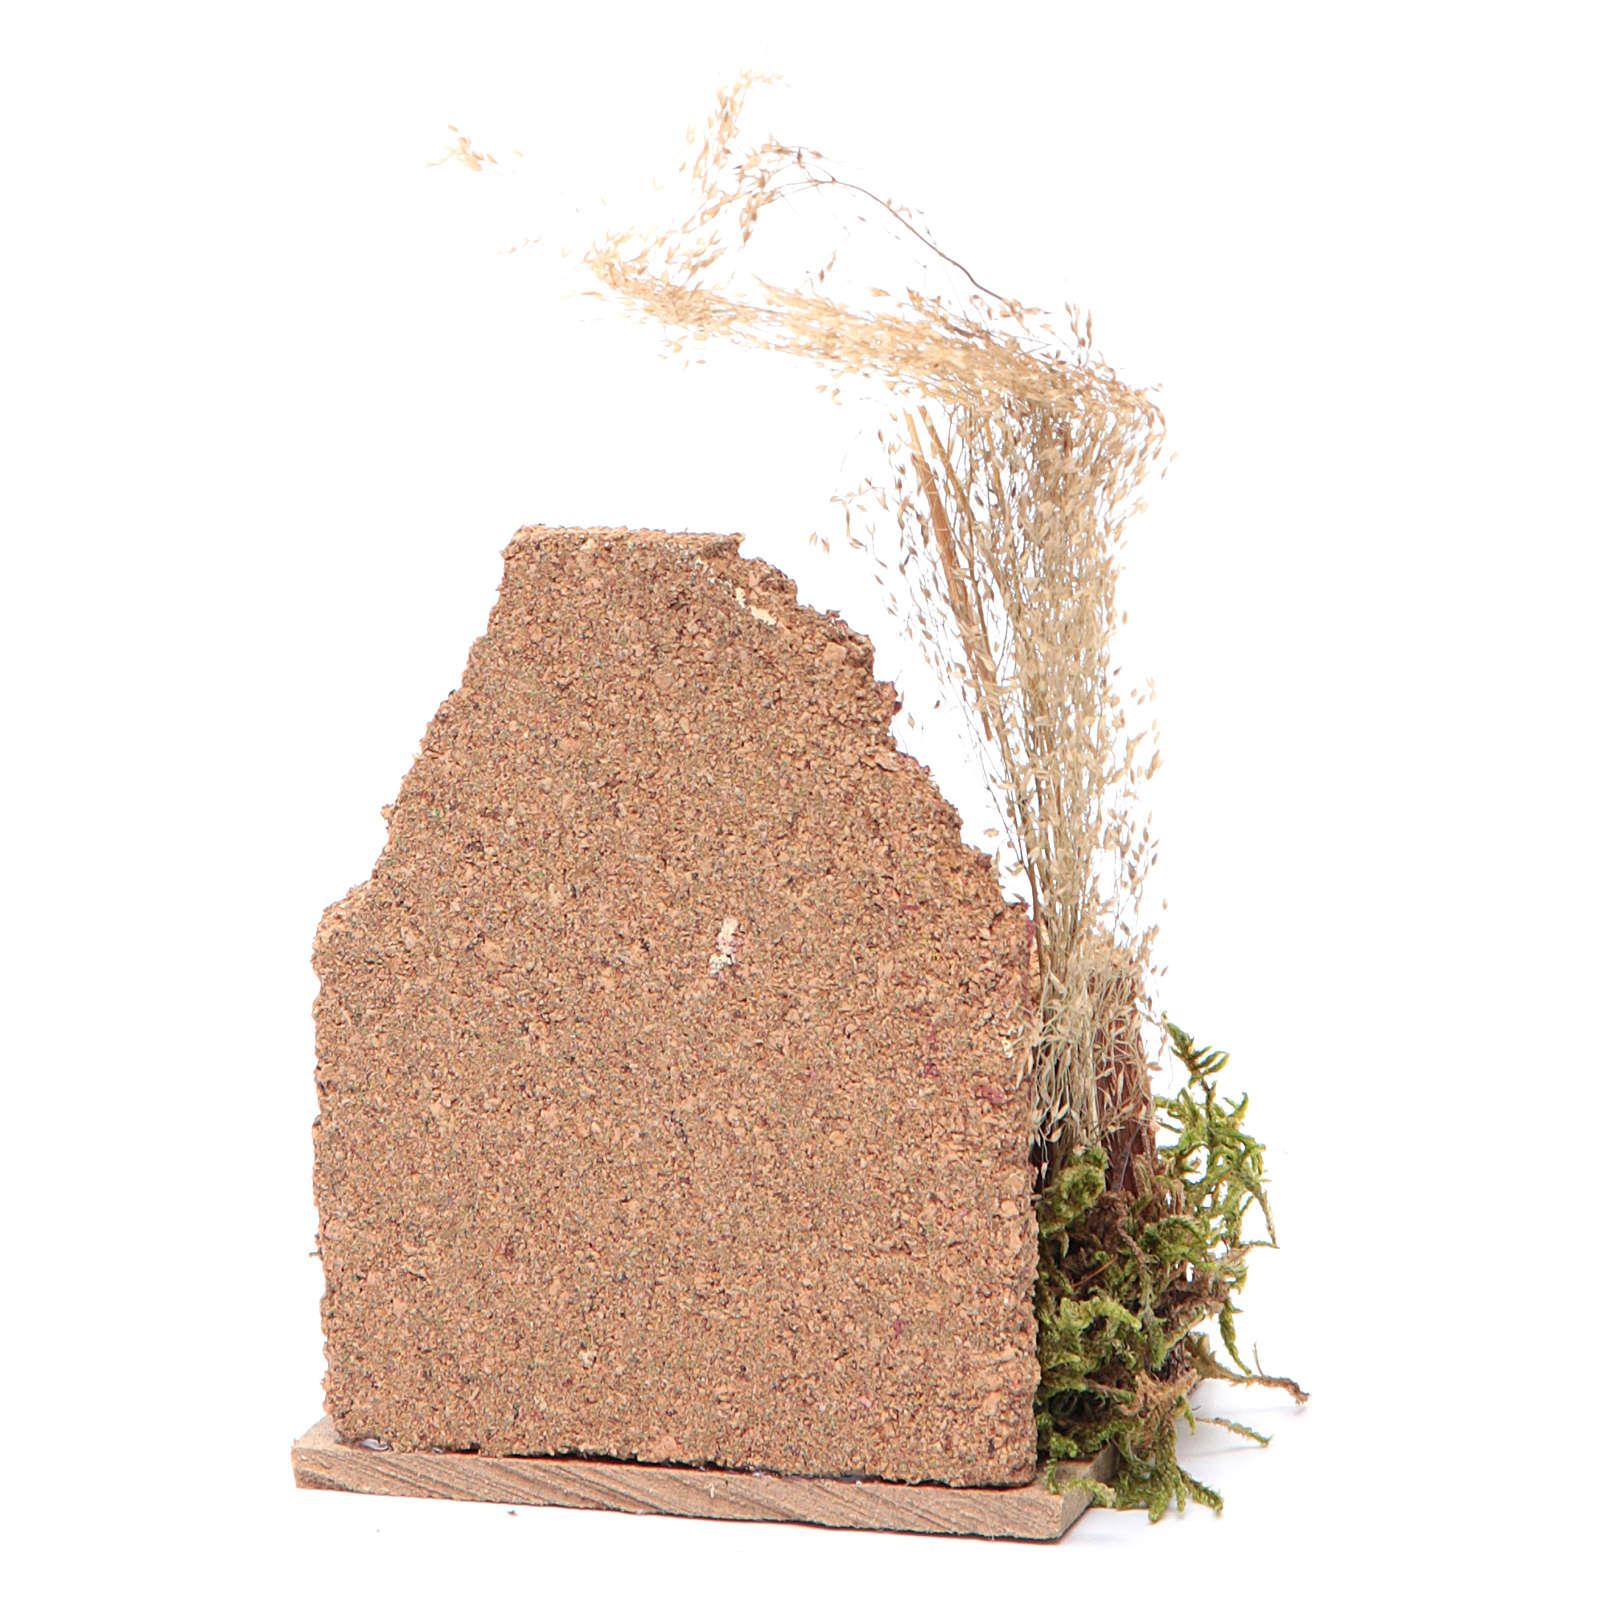 Décor crèche dame-jeanne mur liège 14x9x6 cm 4